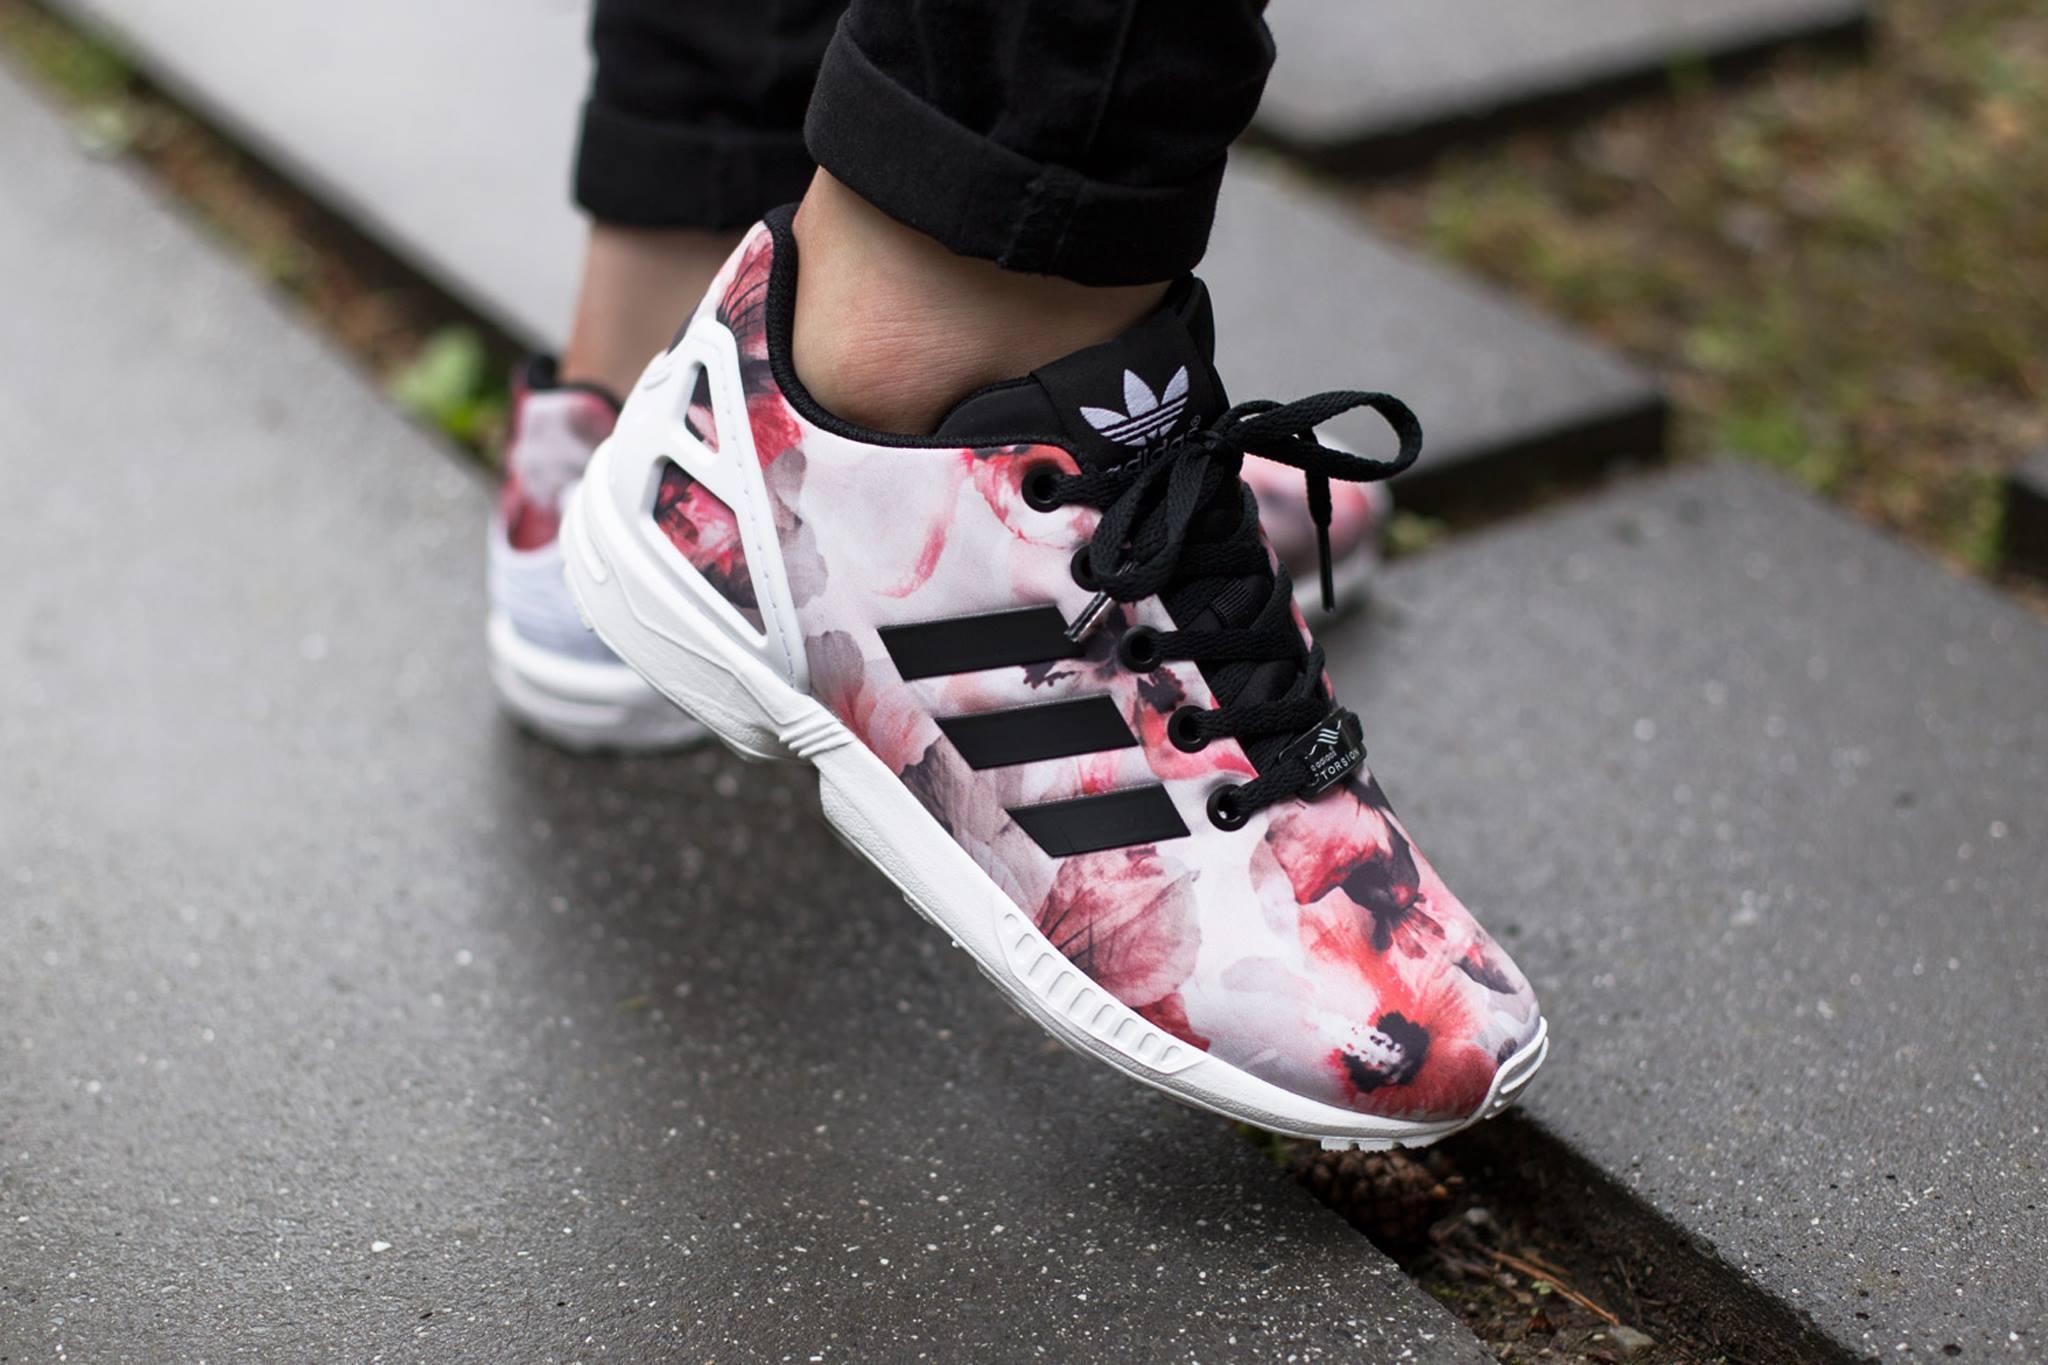 Adidas Zx Flux Pink | Adidas Zx Flux Core Black | Zx Flux Floral